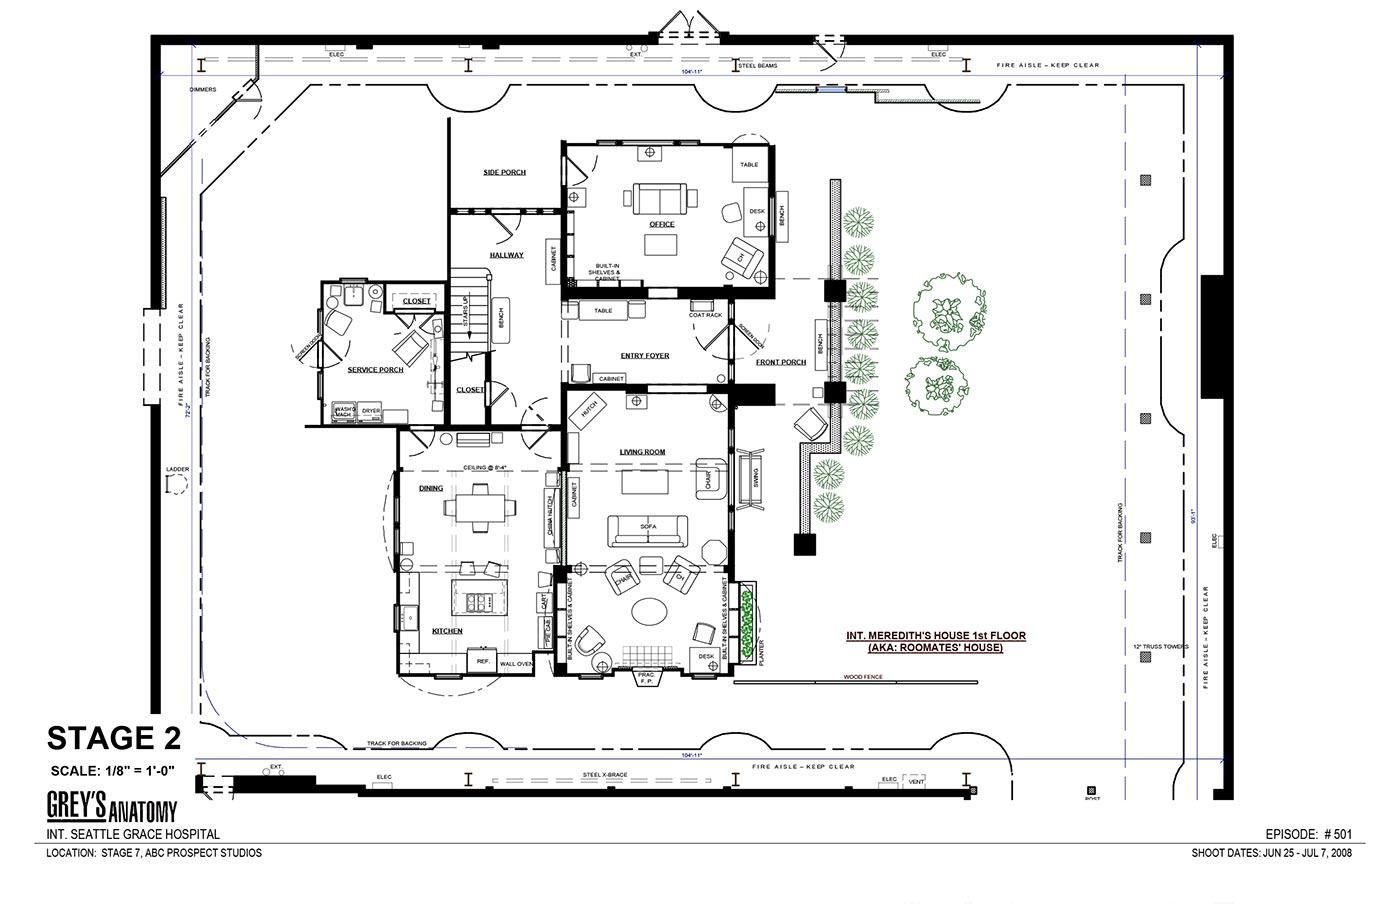 Greys Anatomy Merediths House — Sceneups